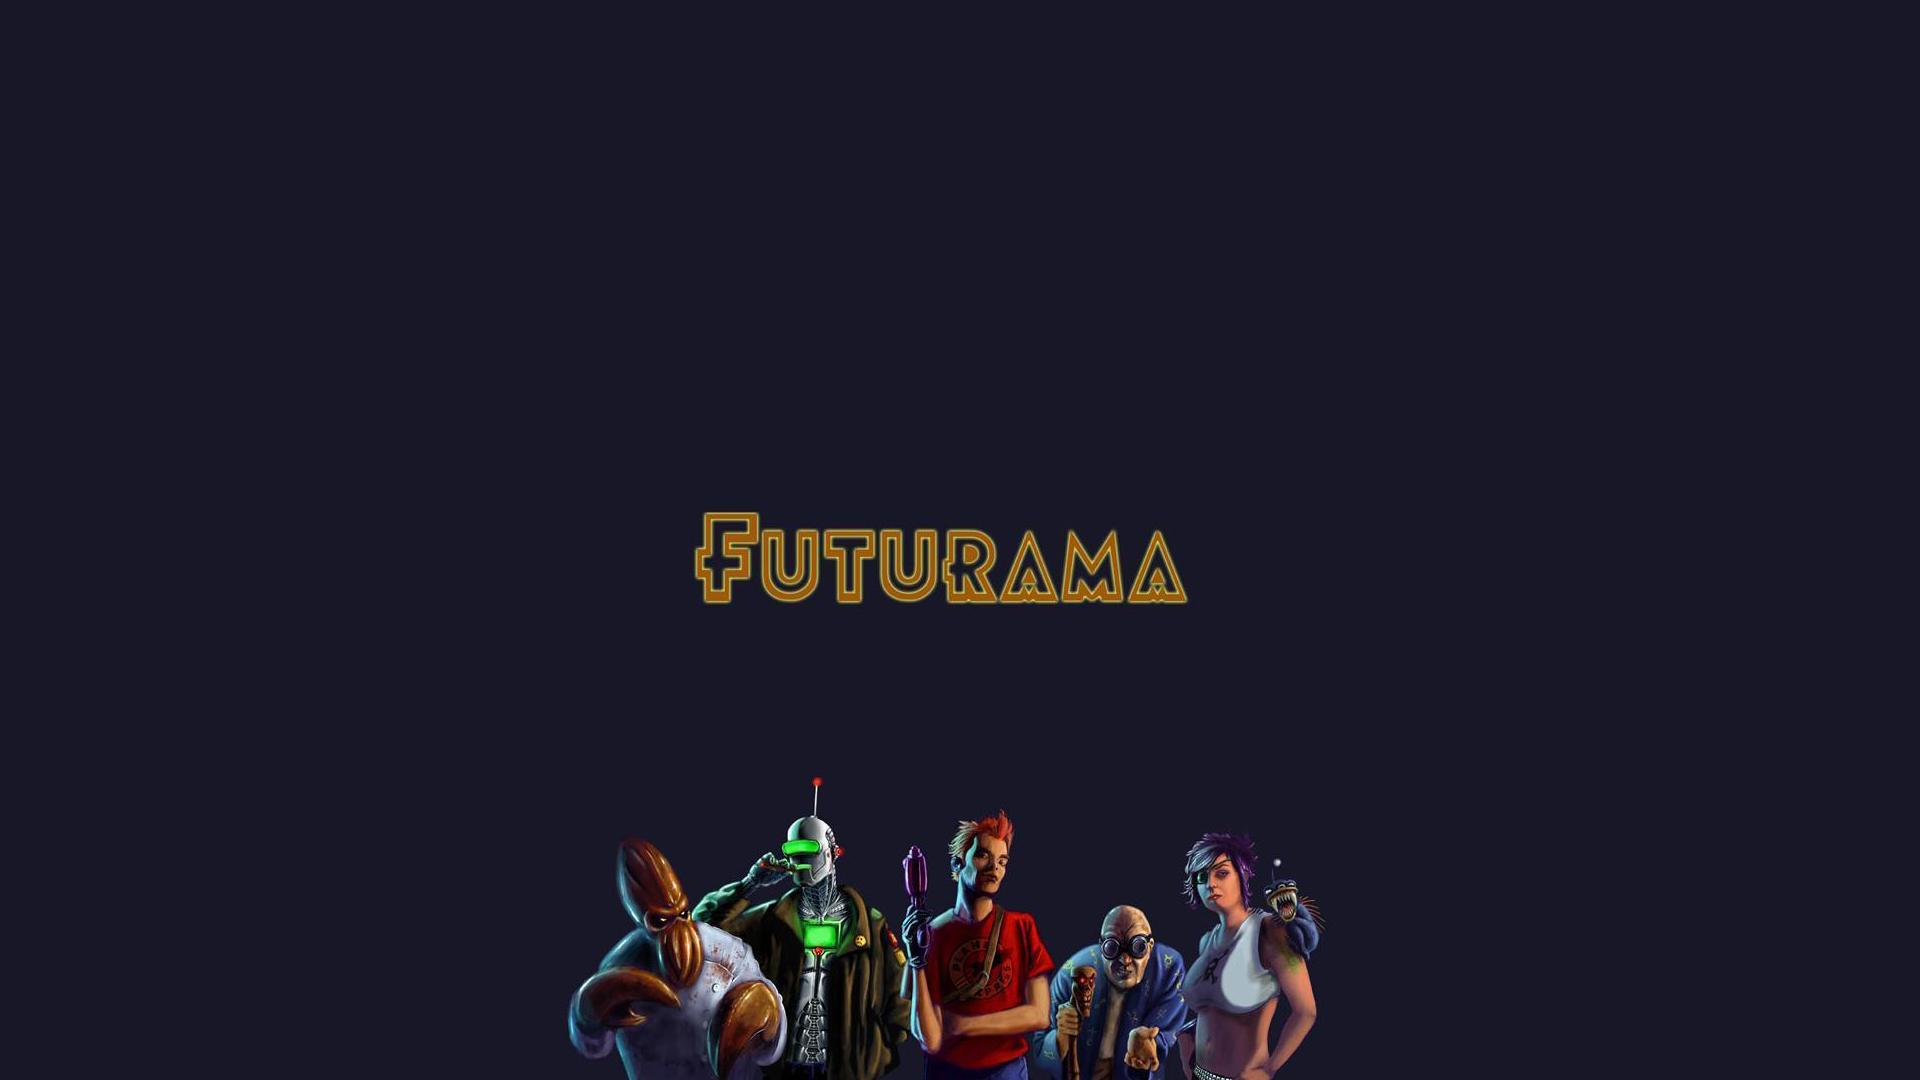 416 futurama hd wallpapers background images wallpaper - Futurama wallpaper ...